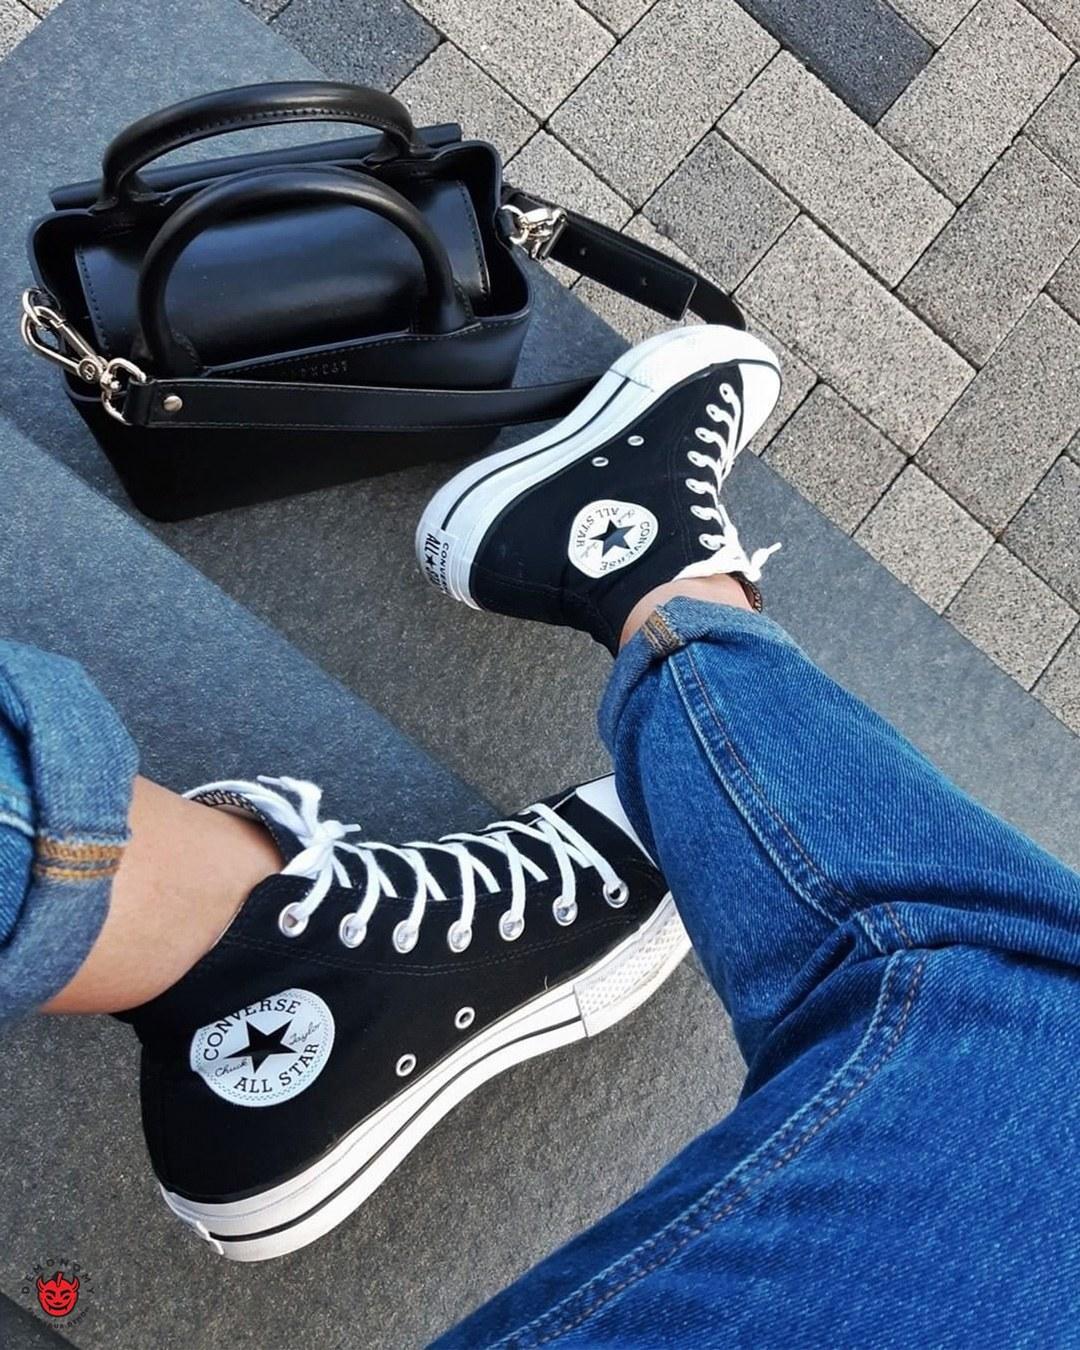 تصویر کفش Converse All Star ساق بلند مشکی